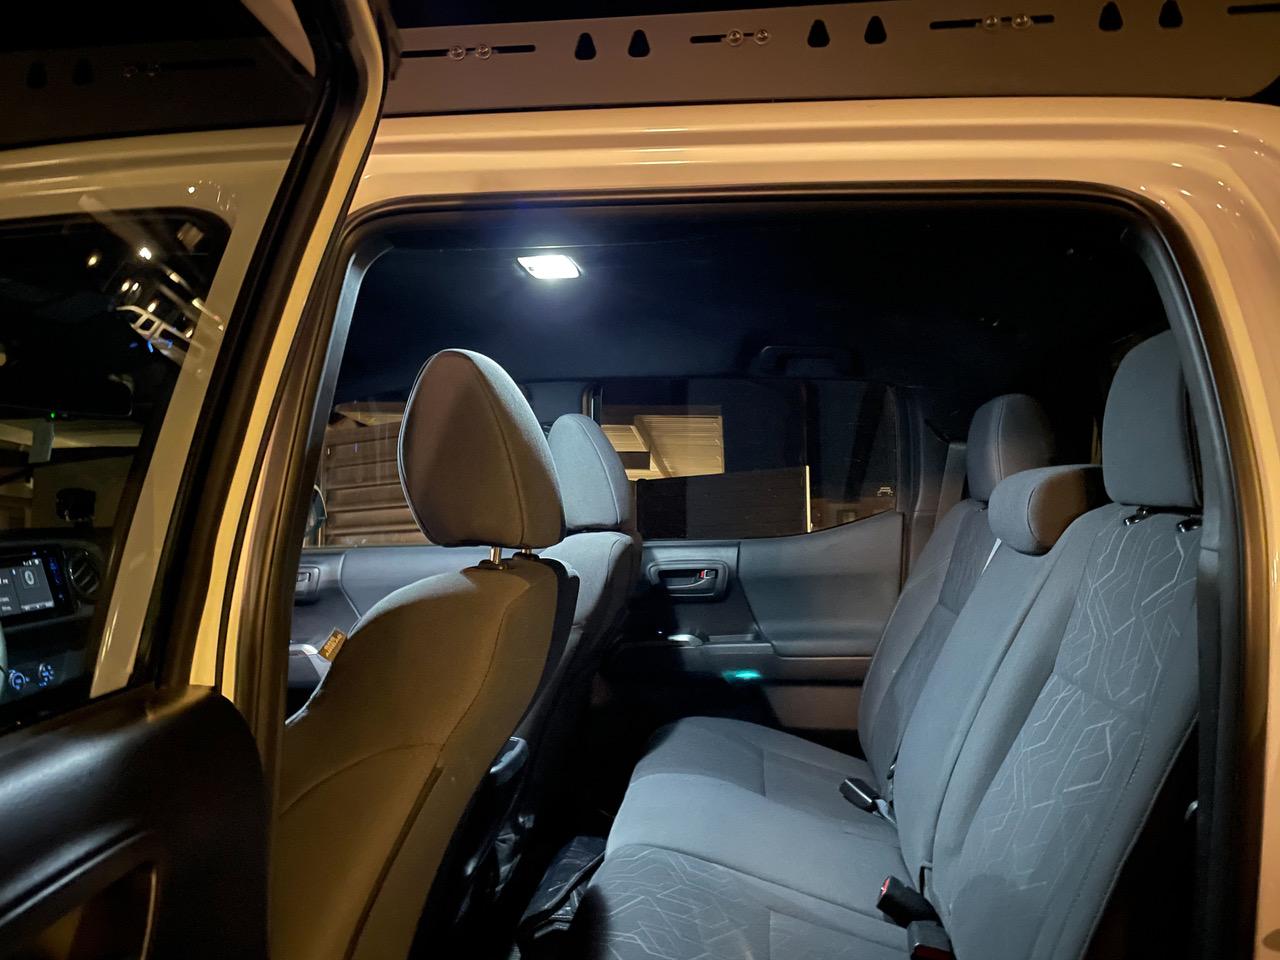 Affordable LED Interior Light Upgrade for 3rd gen Tacoma